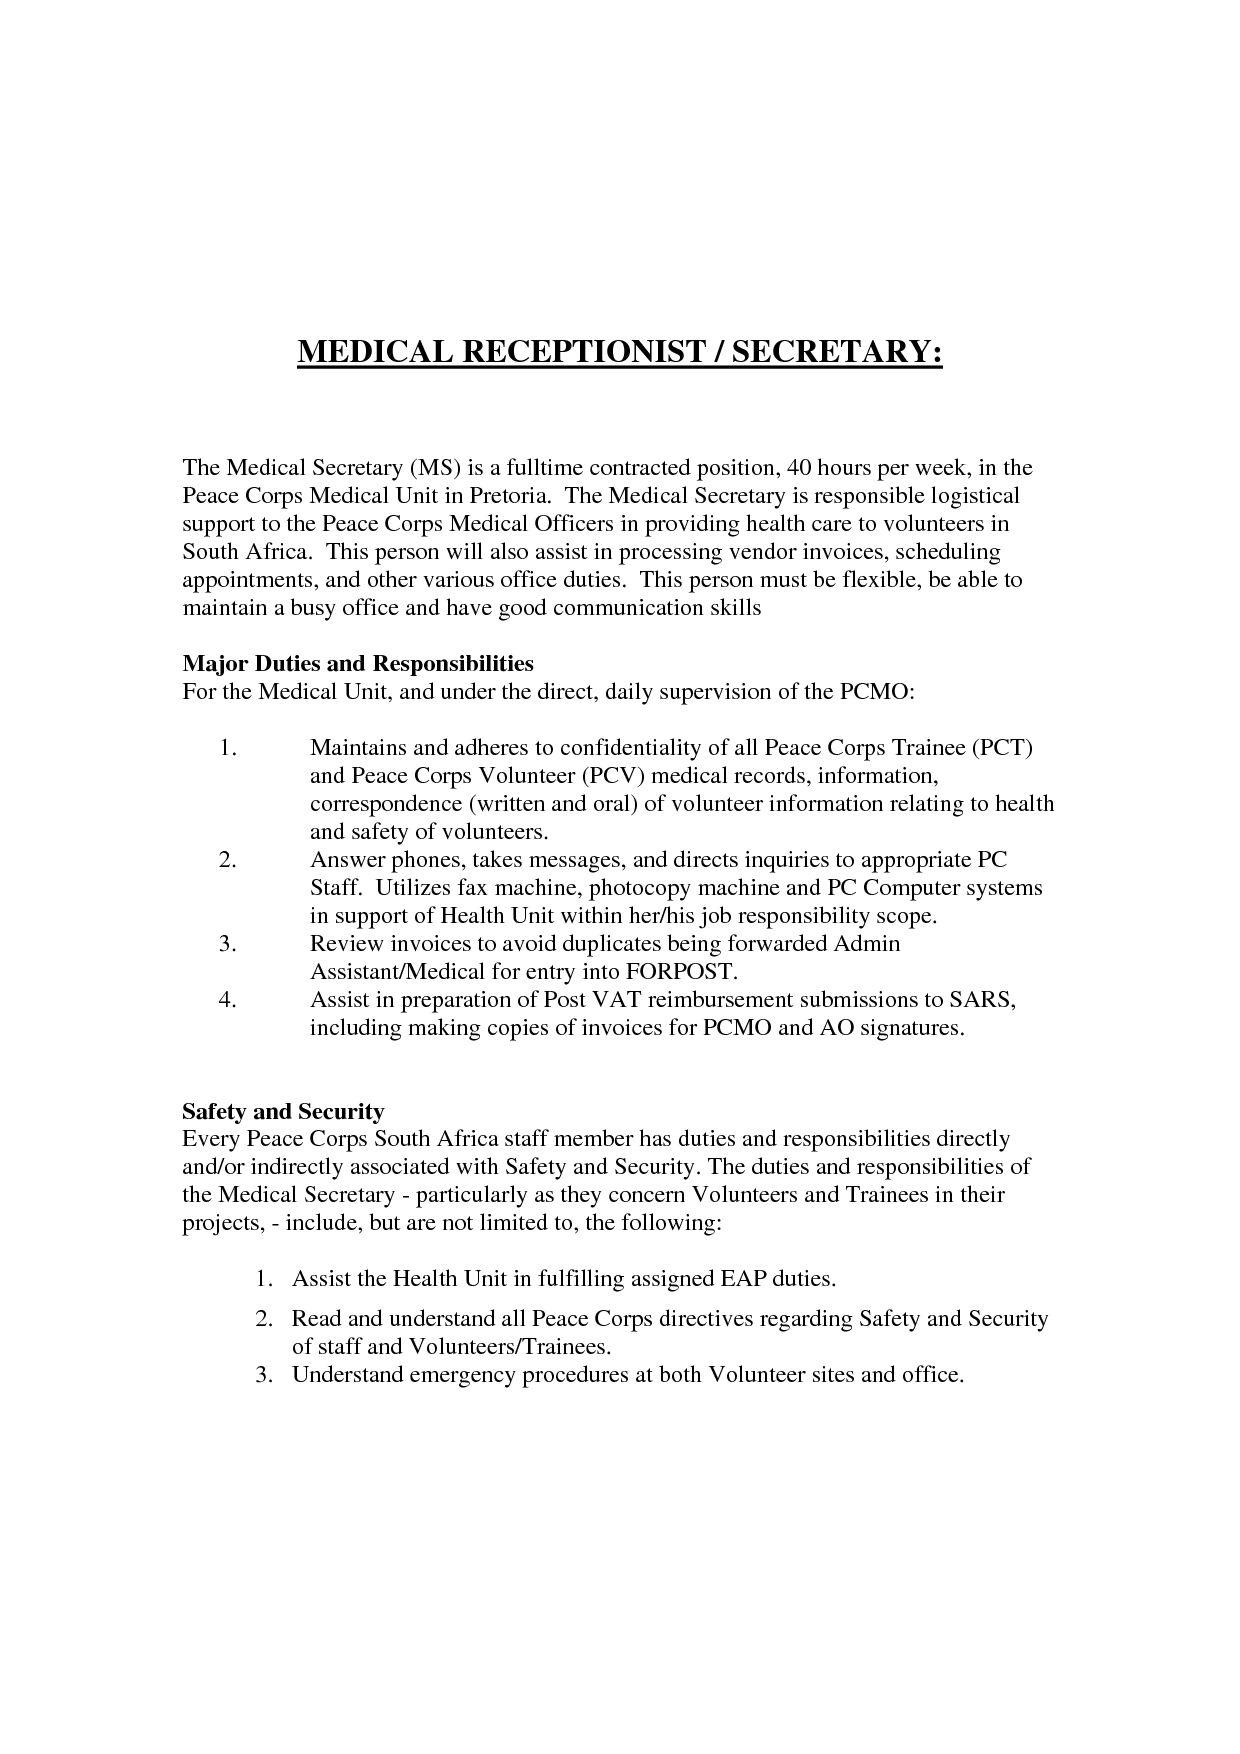 26+ Medical Receptionist Cover Letter Cover letter for